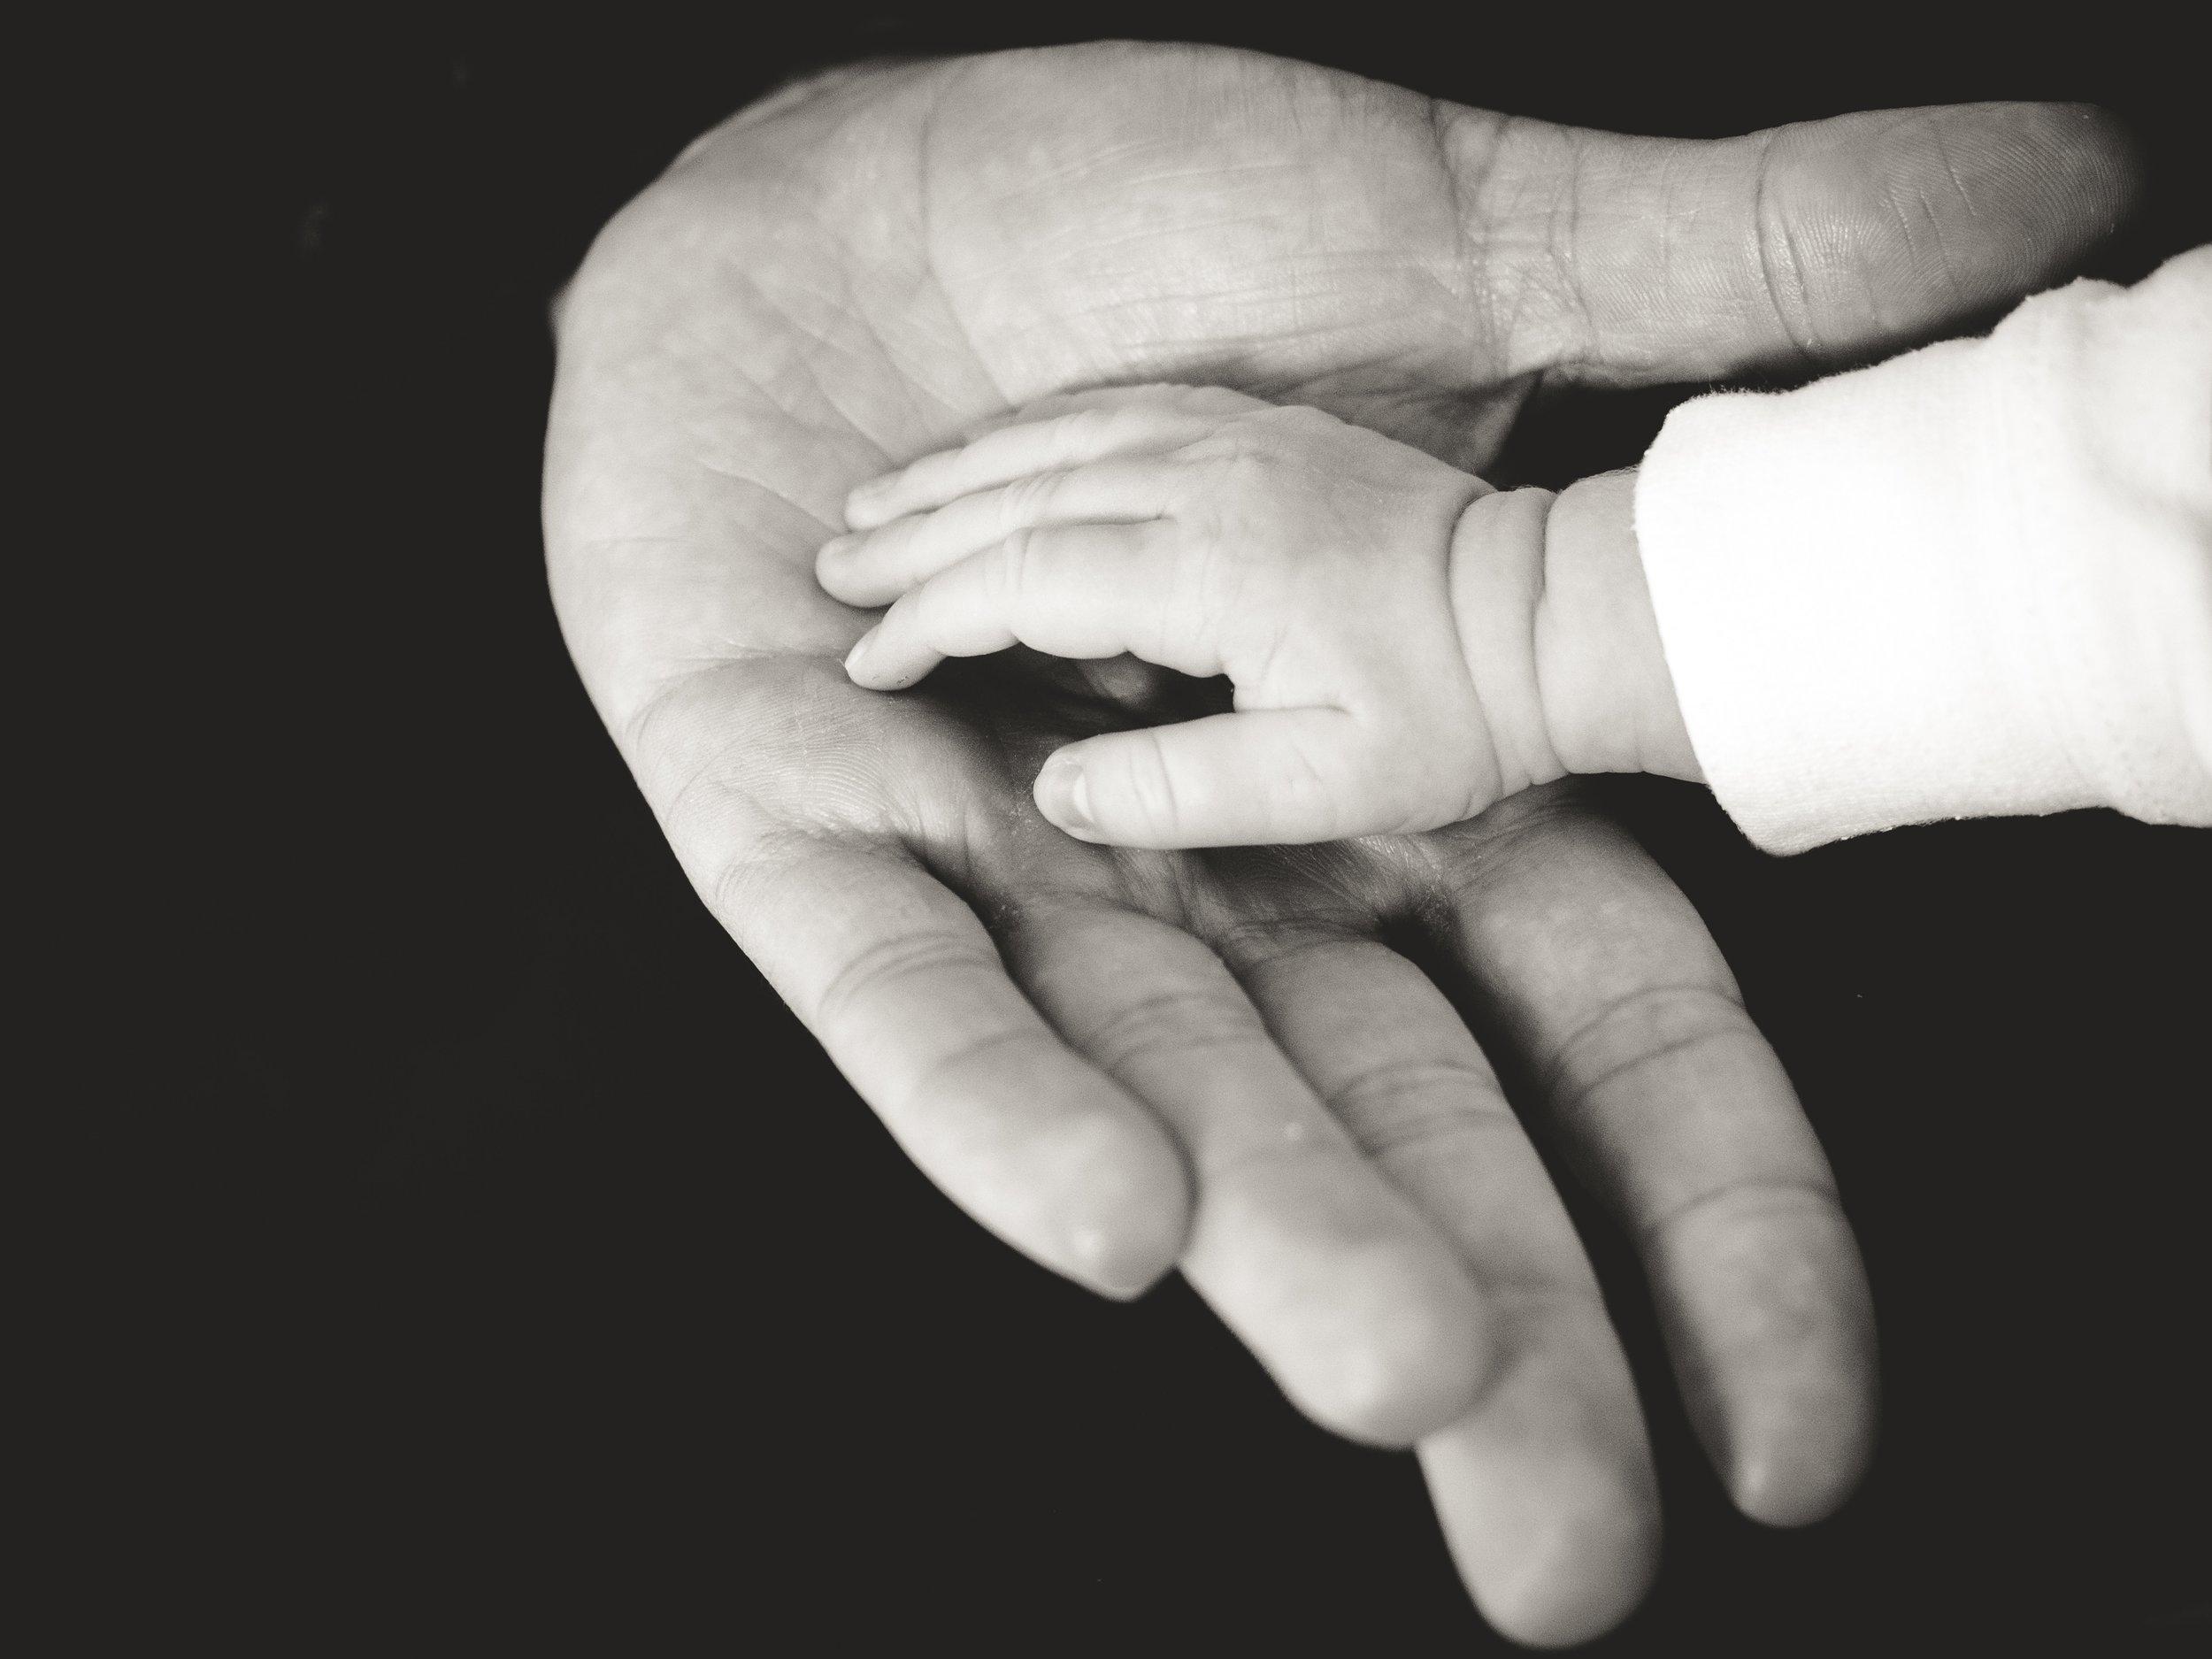 liane-metzler-baby-hand-unsplash.jpg